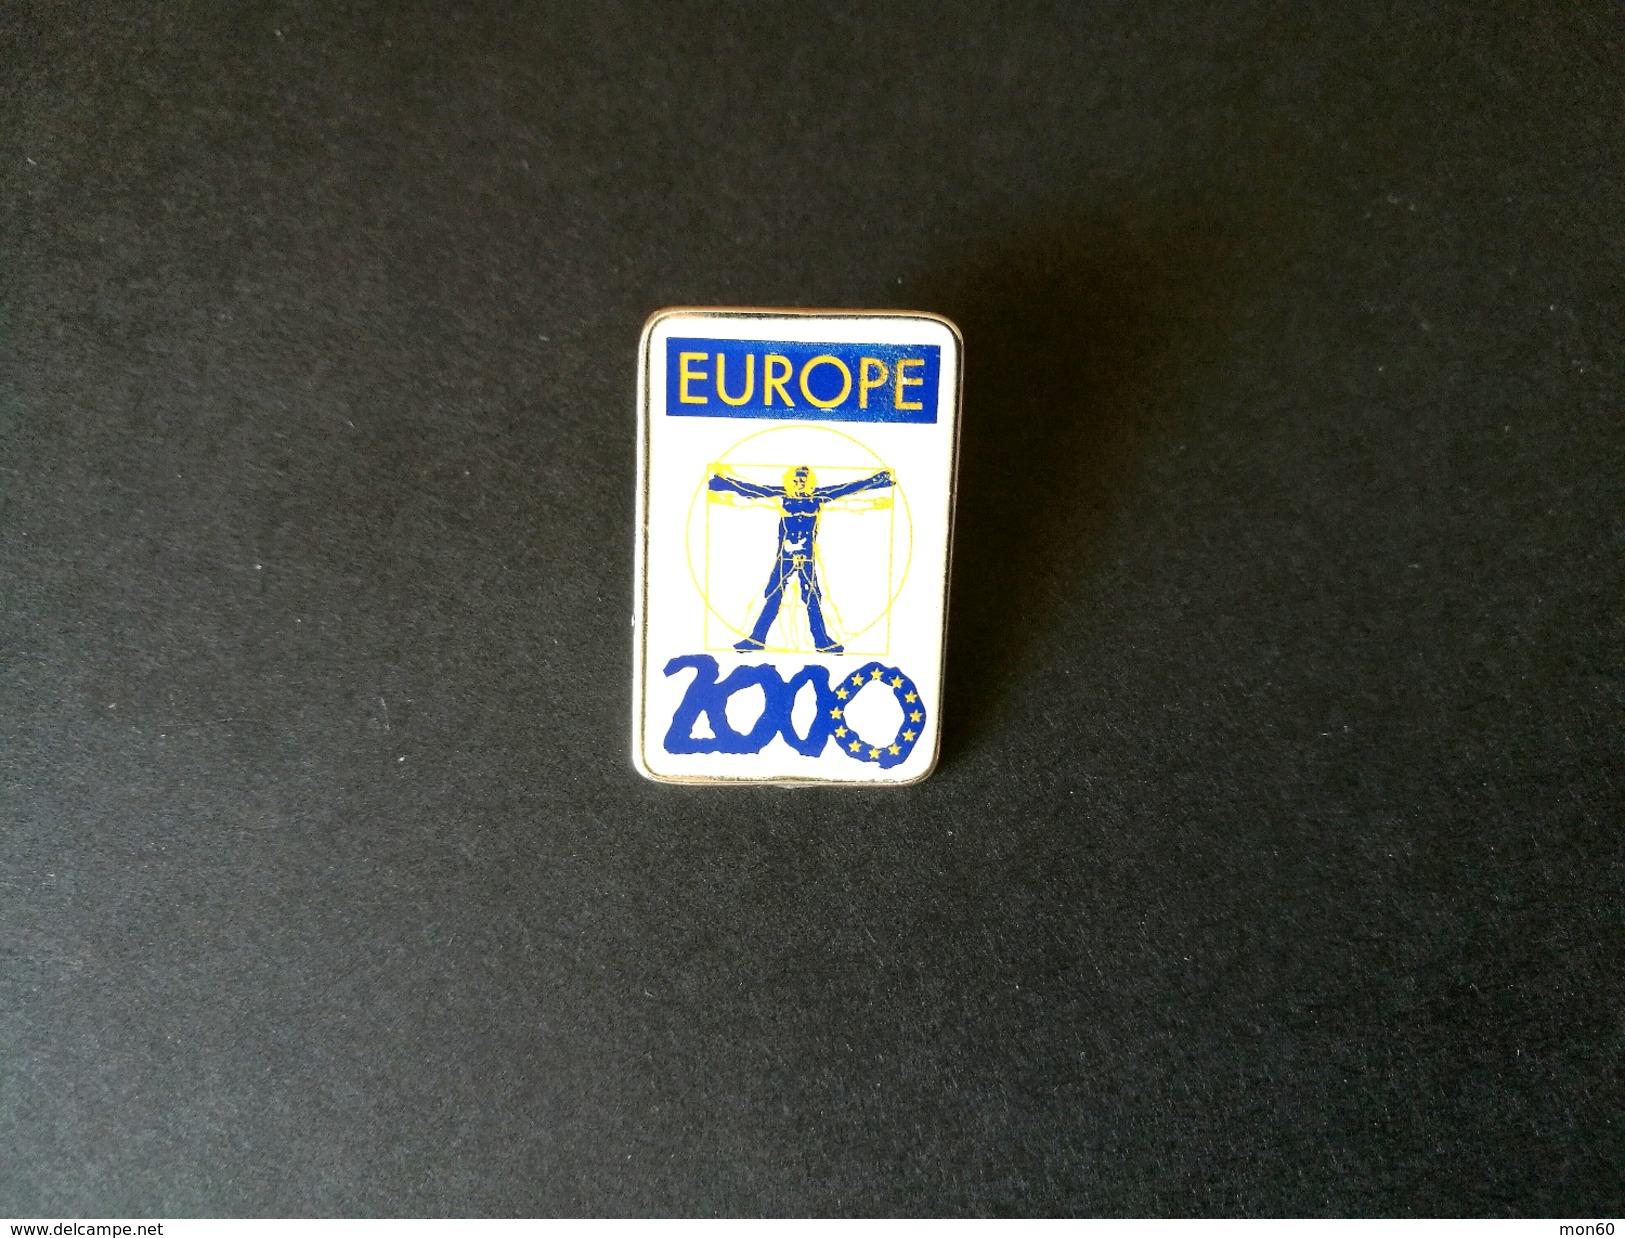 Pin Europa 2000 -P494 - Pin's